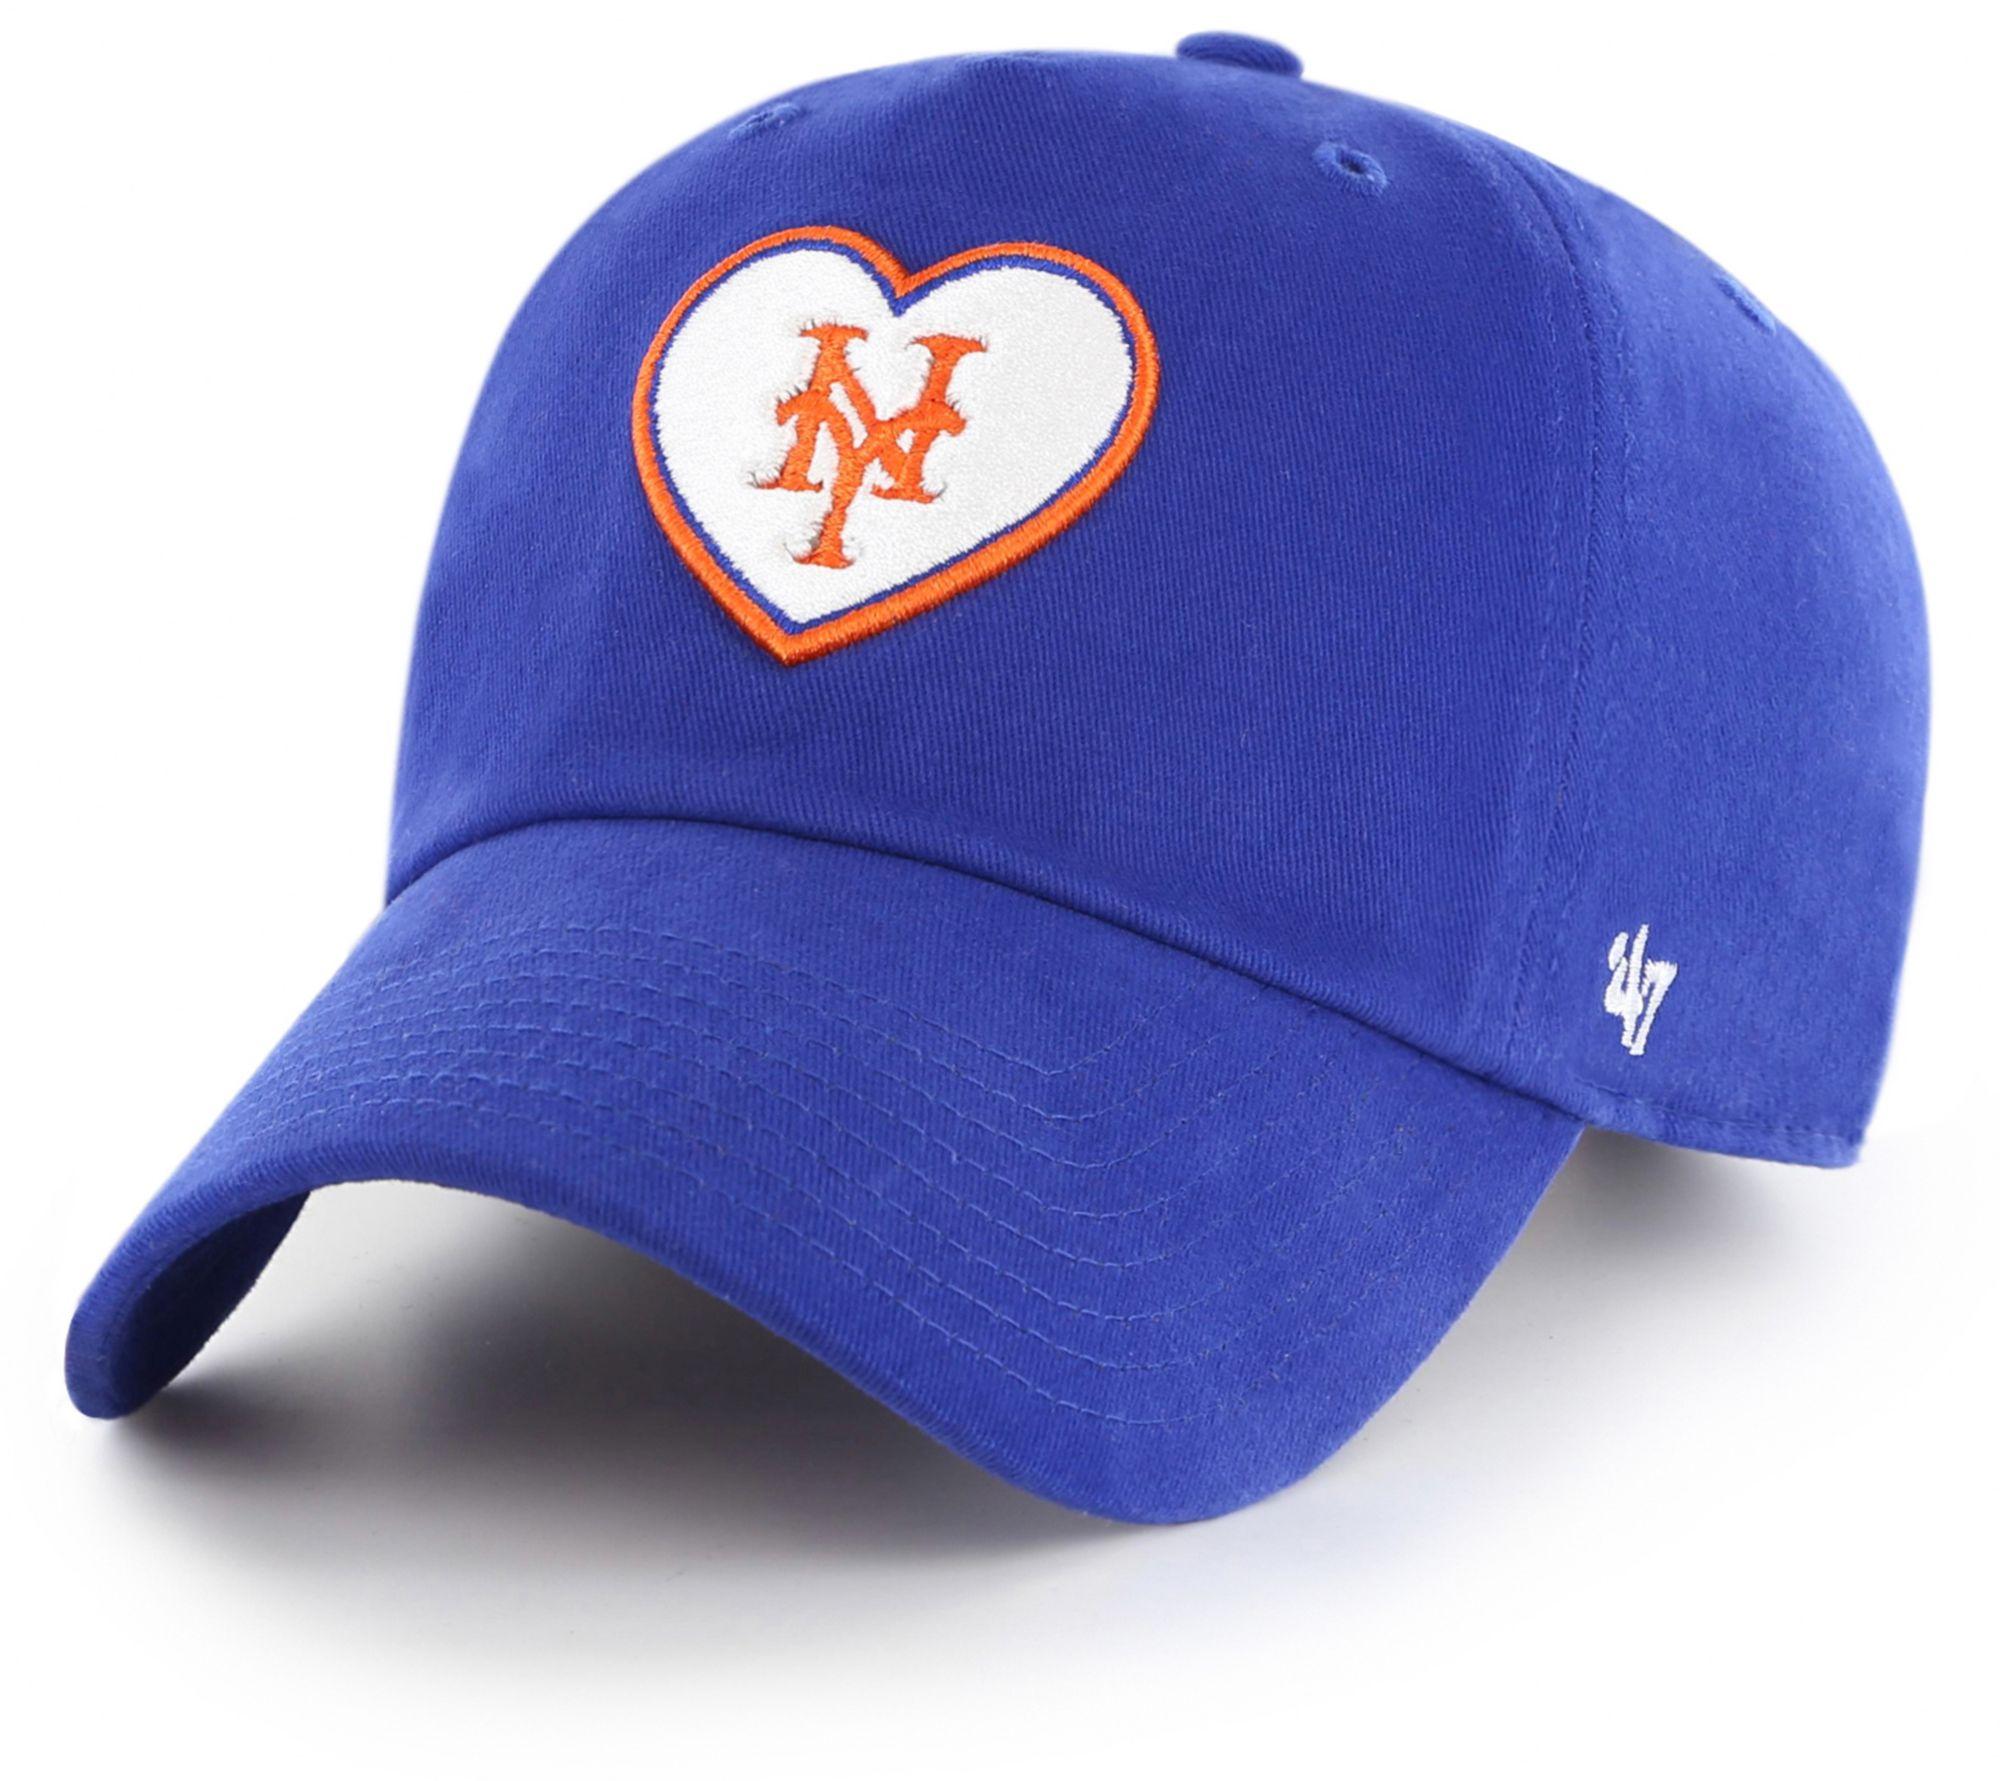 b1002dbb417 ... usa 47 womens new york mets courtney clean up adjustable hat 8fe0b b7662